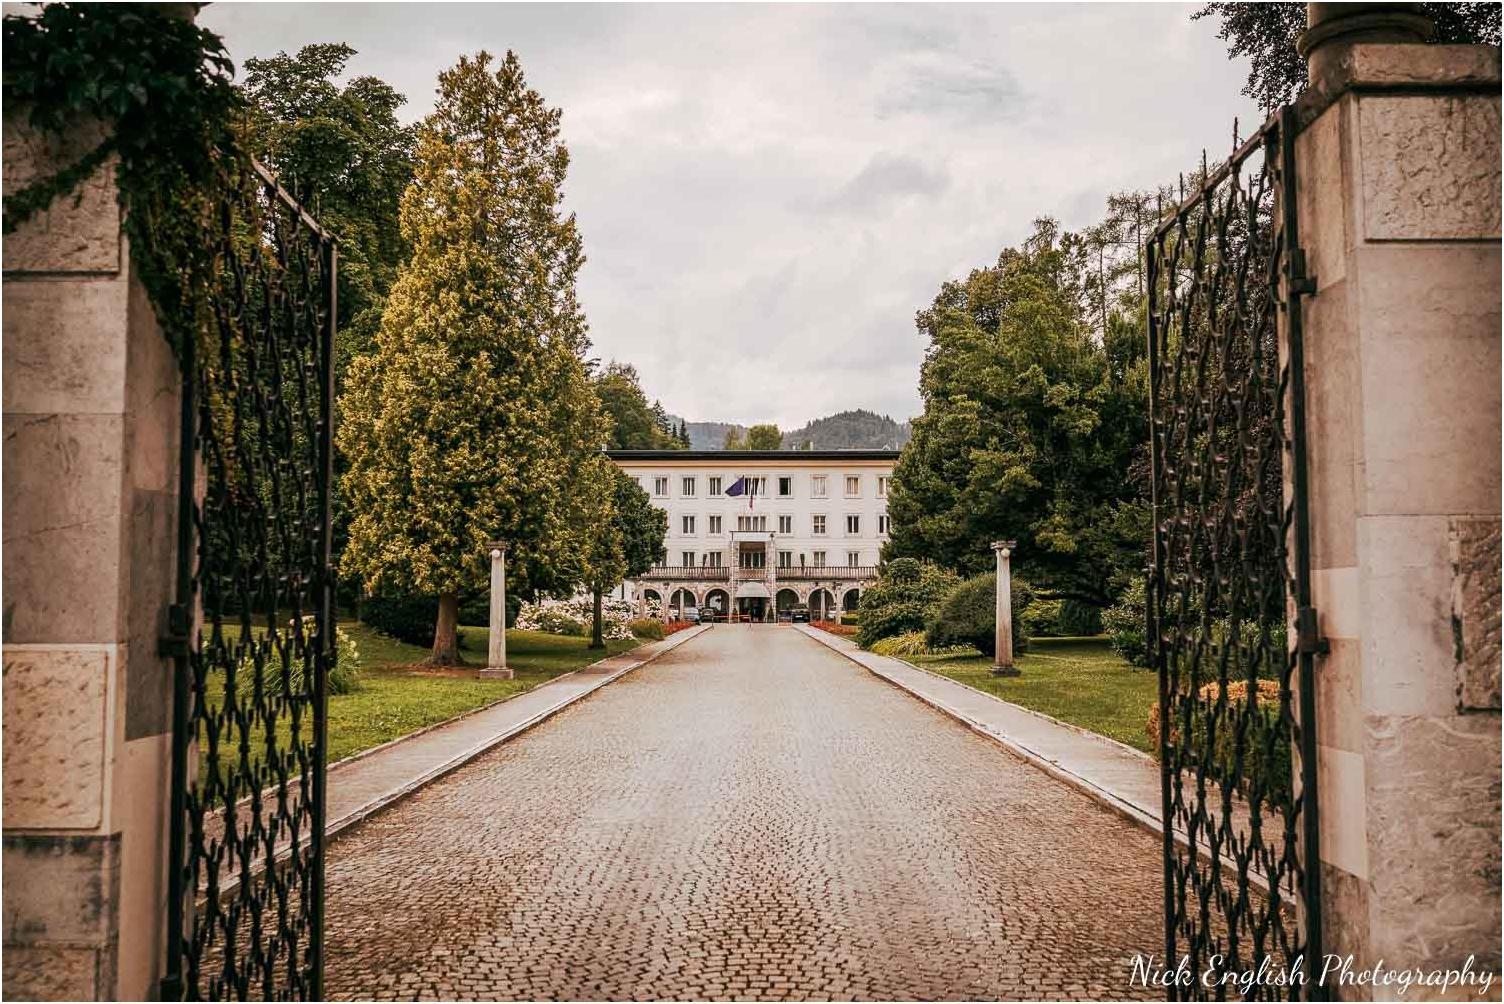 Destination_Wedding_Photographer_Slovenia_Nick_English_Photography-1.jpg